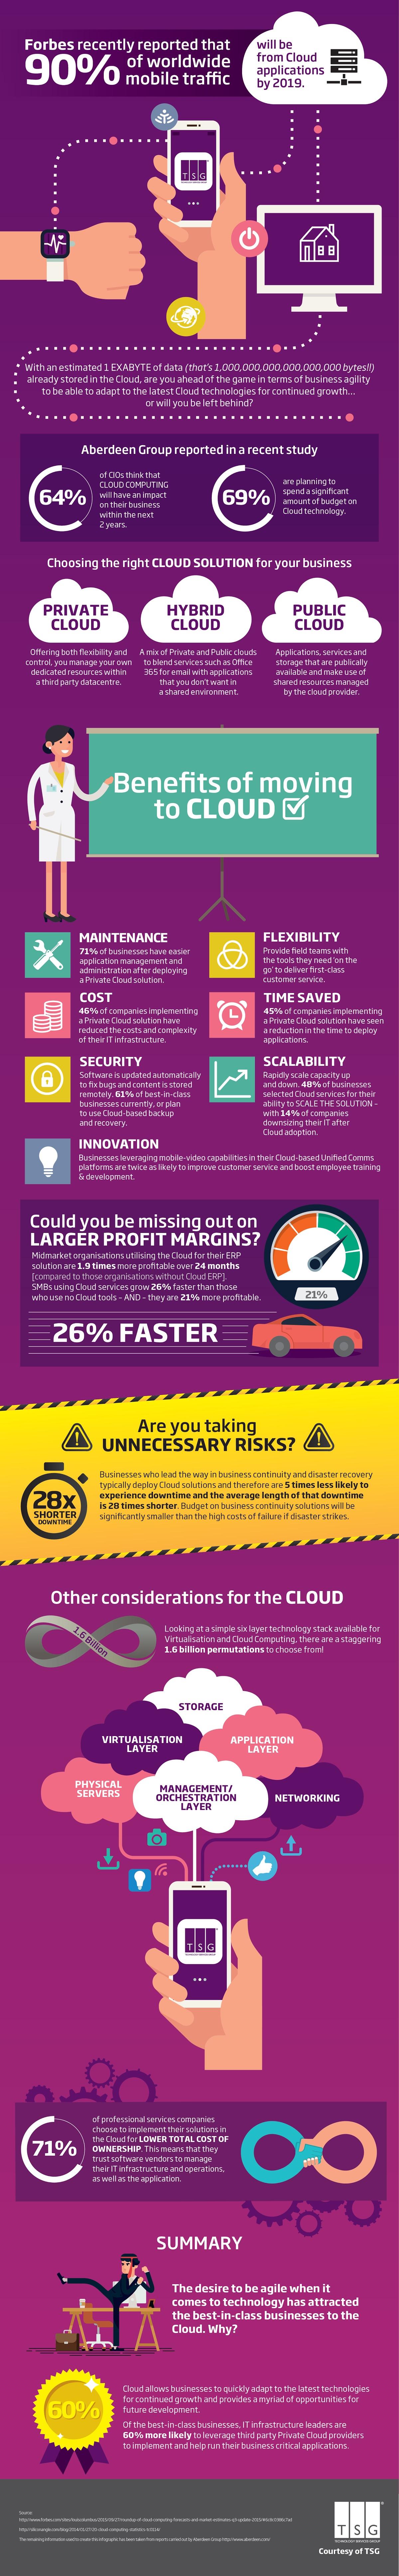 Infographic benefits of cloud computing